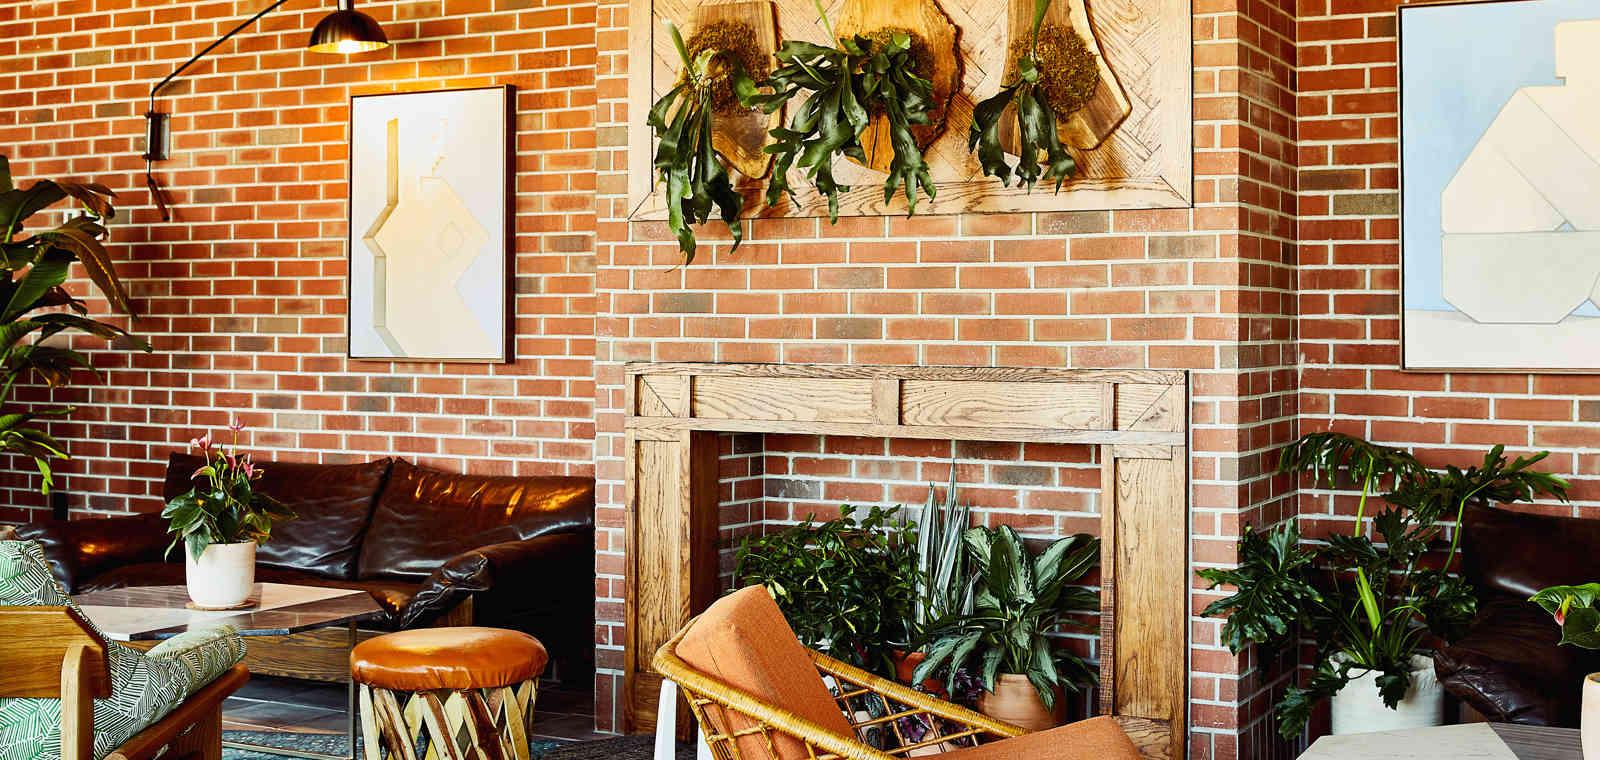 Topside Restaurant garden Room Wall